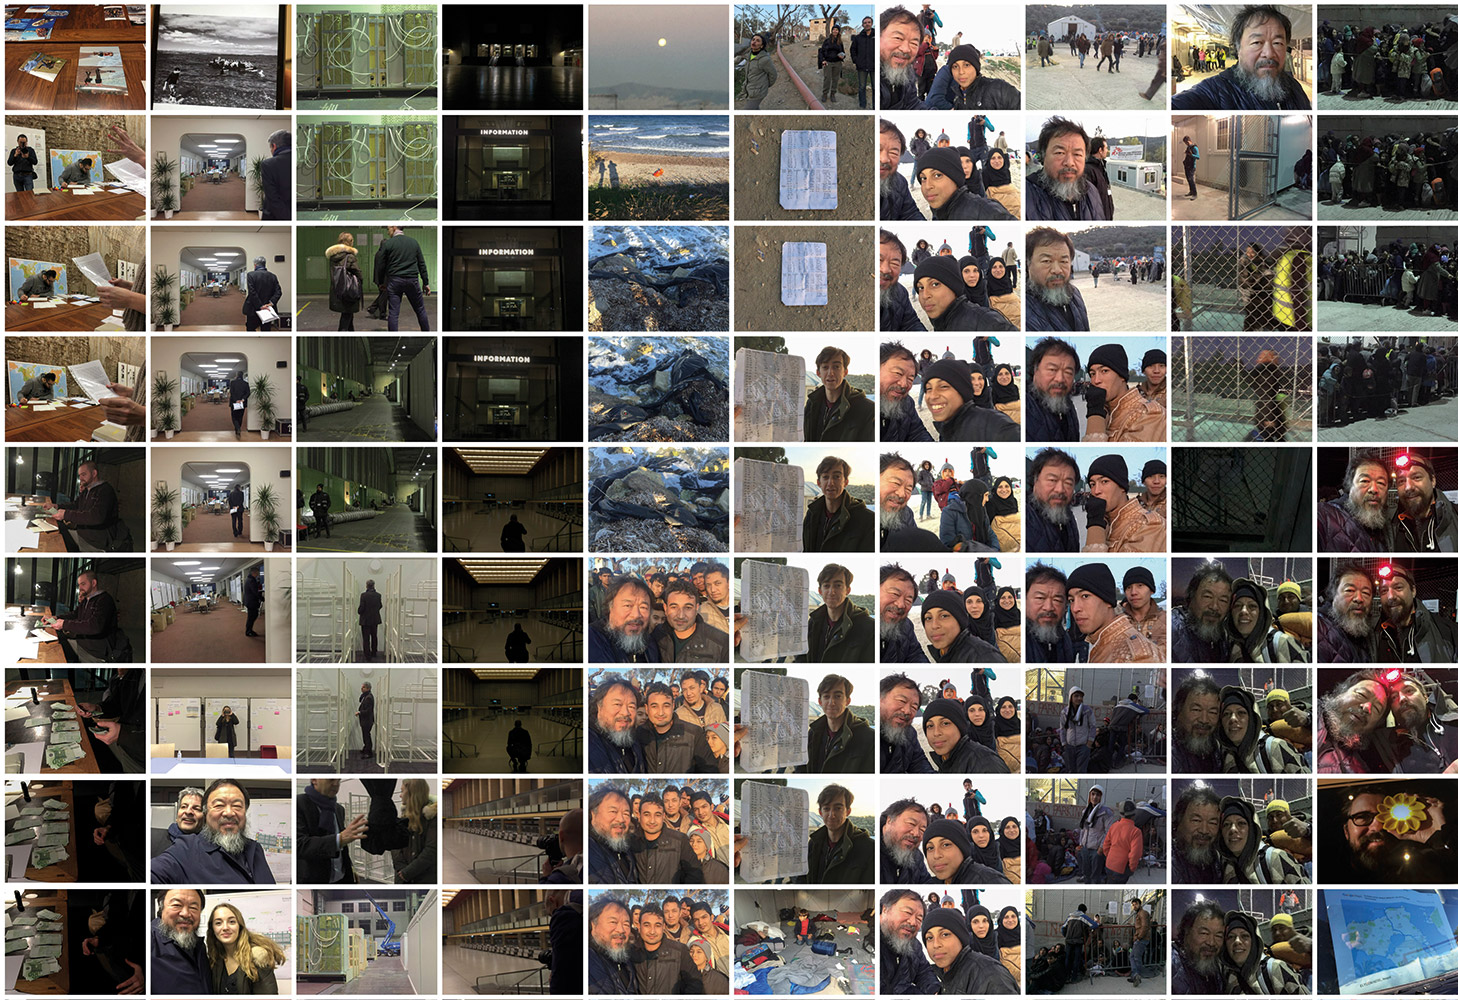 Ai Weiwei, 320 Photos Related to Refugees, 01.12 - 01.27, 2015 Wallpaper. Digital Print. photo © Ai Weiwei Studio, Berlín, 2017 Medidas variables